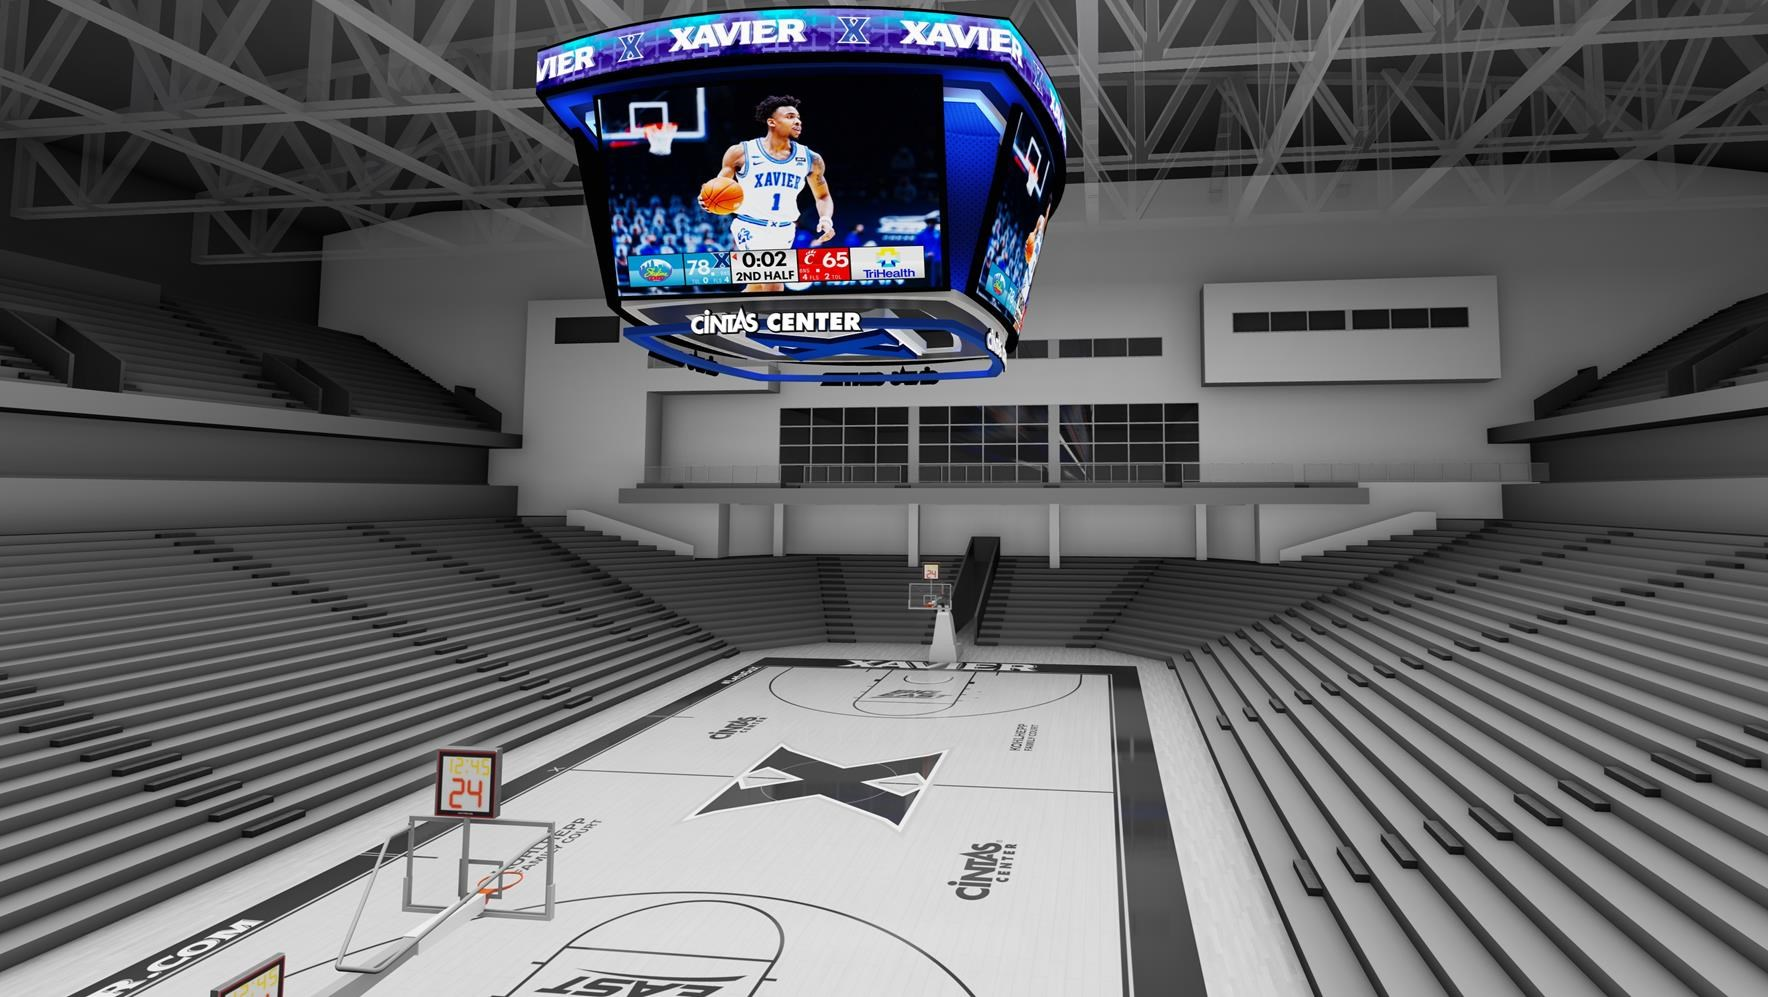 Xavier unveils $3 million project to add a new scoreboard, upgrade Cintas Center technology